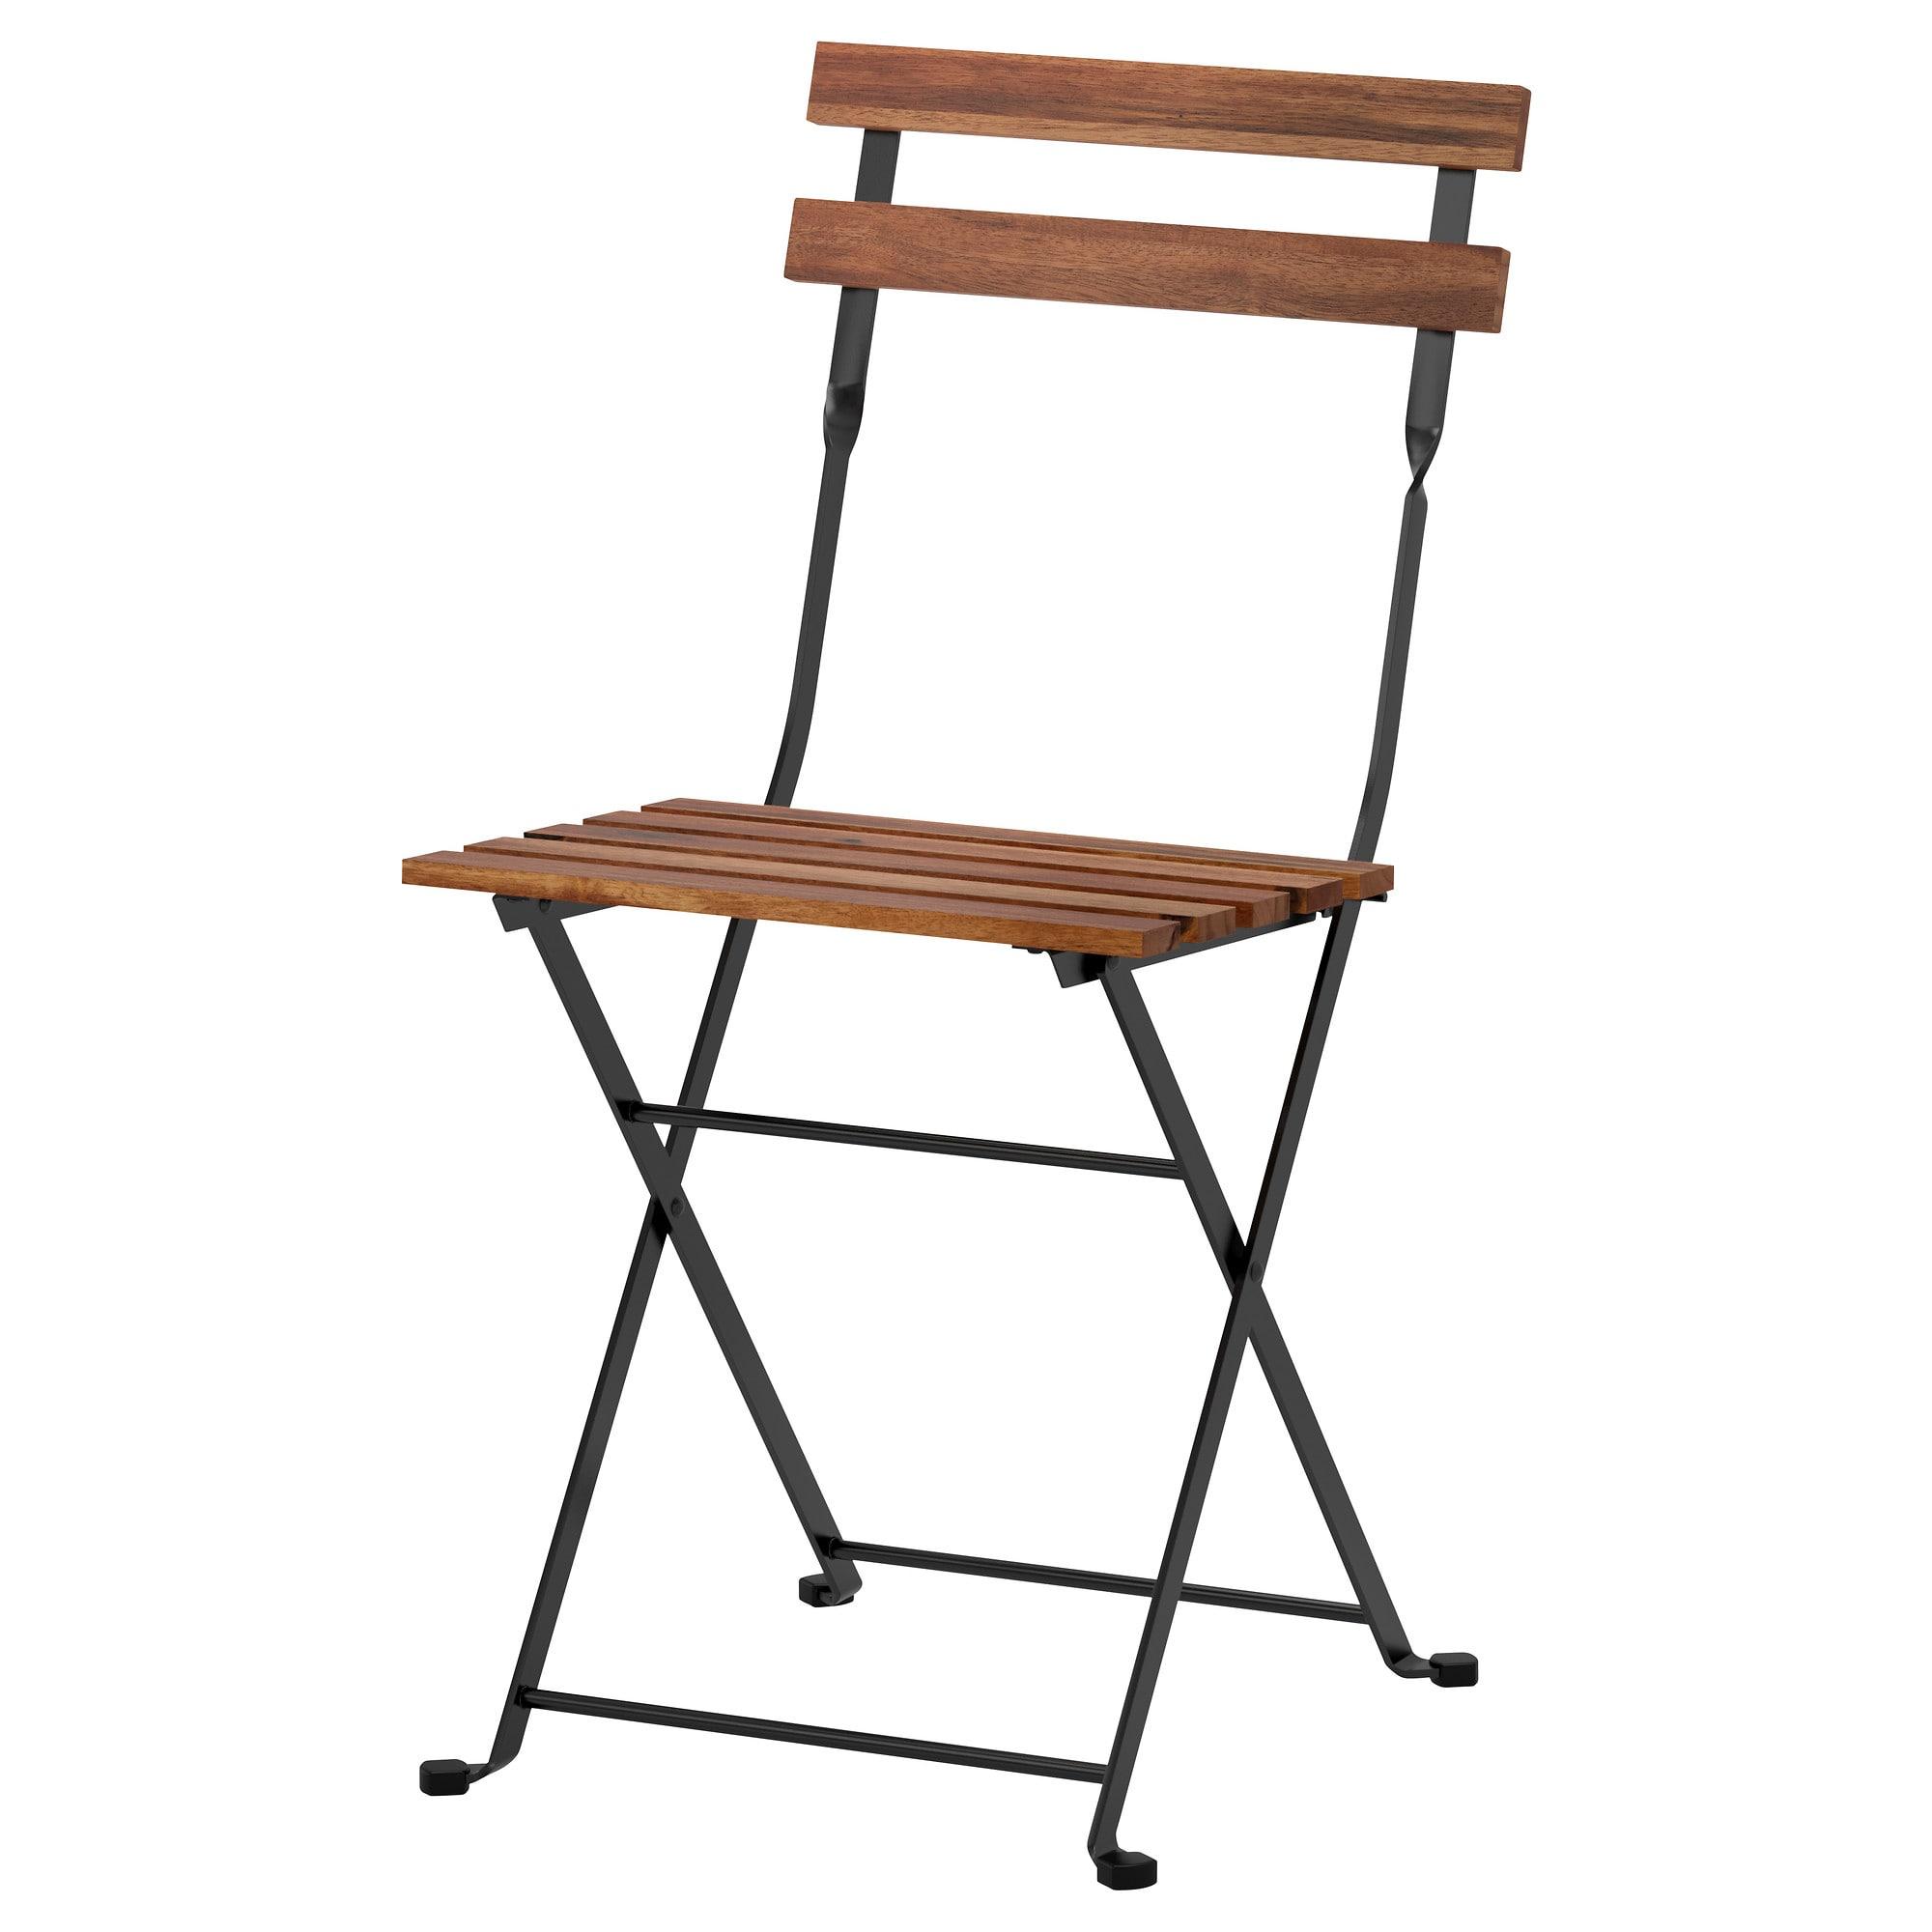 Ikea - Tärnö Chair, Outdoor Foldable Acacia Black, Gray ... concernant Chaises De Jardin Ikea